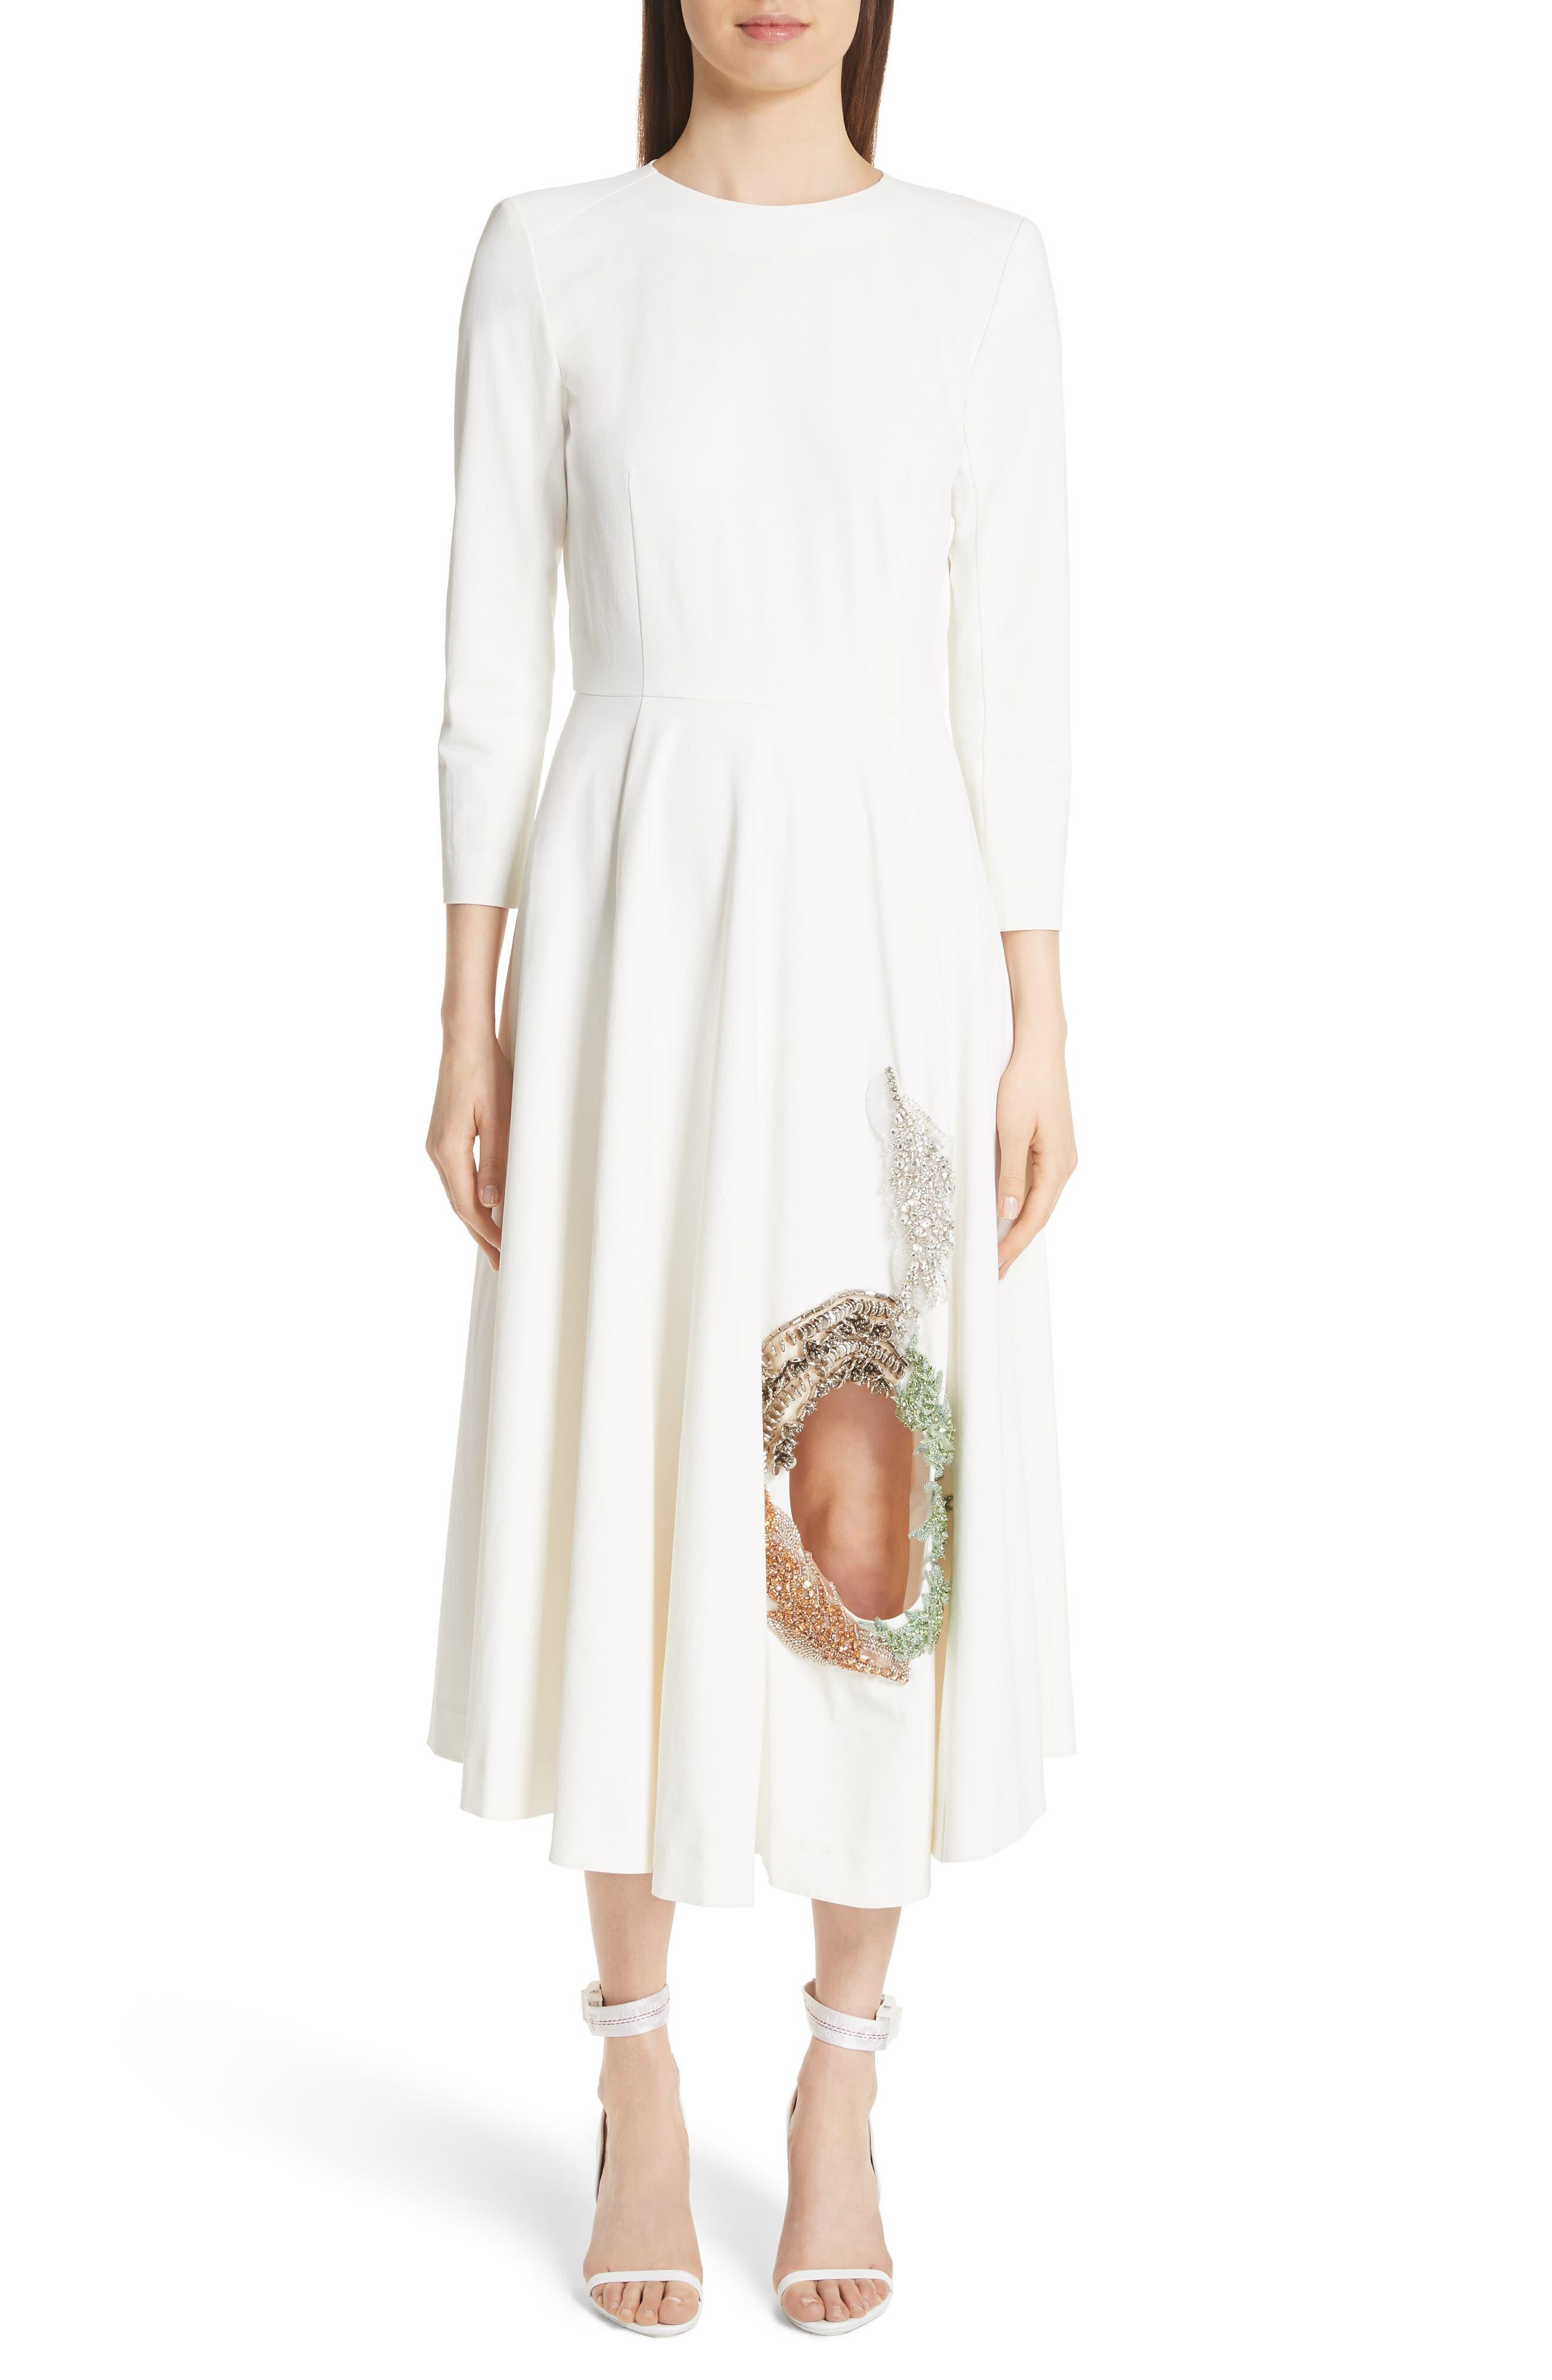 TOGA,                             Beaded Keyhole Dress,                             Main thumbnail 1, color,                             100